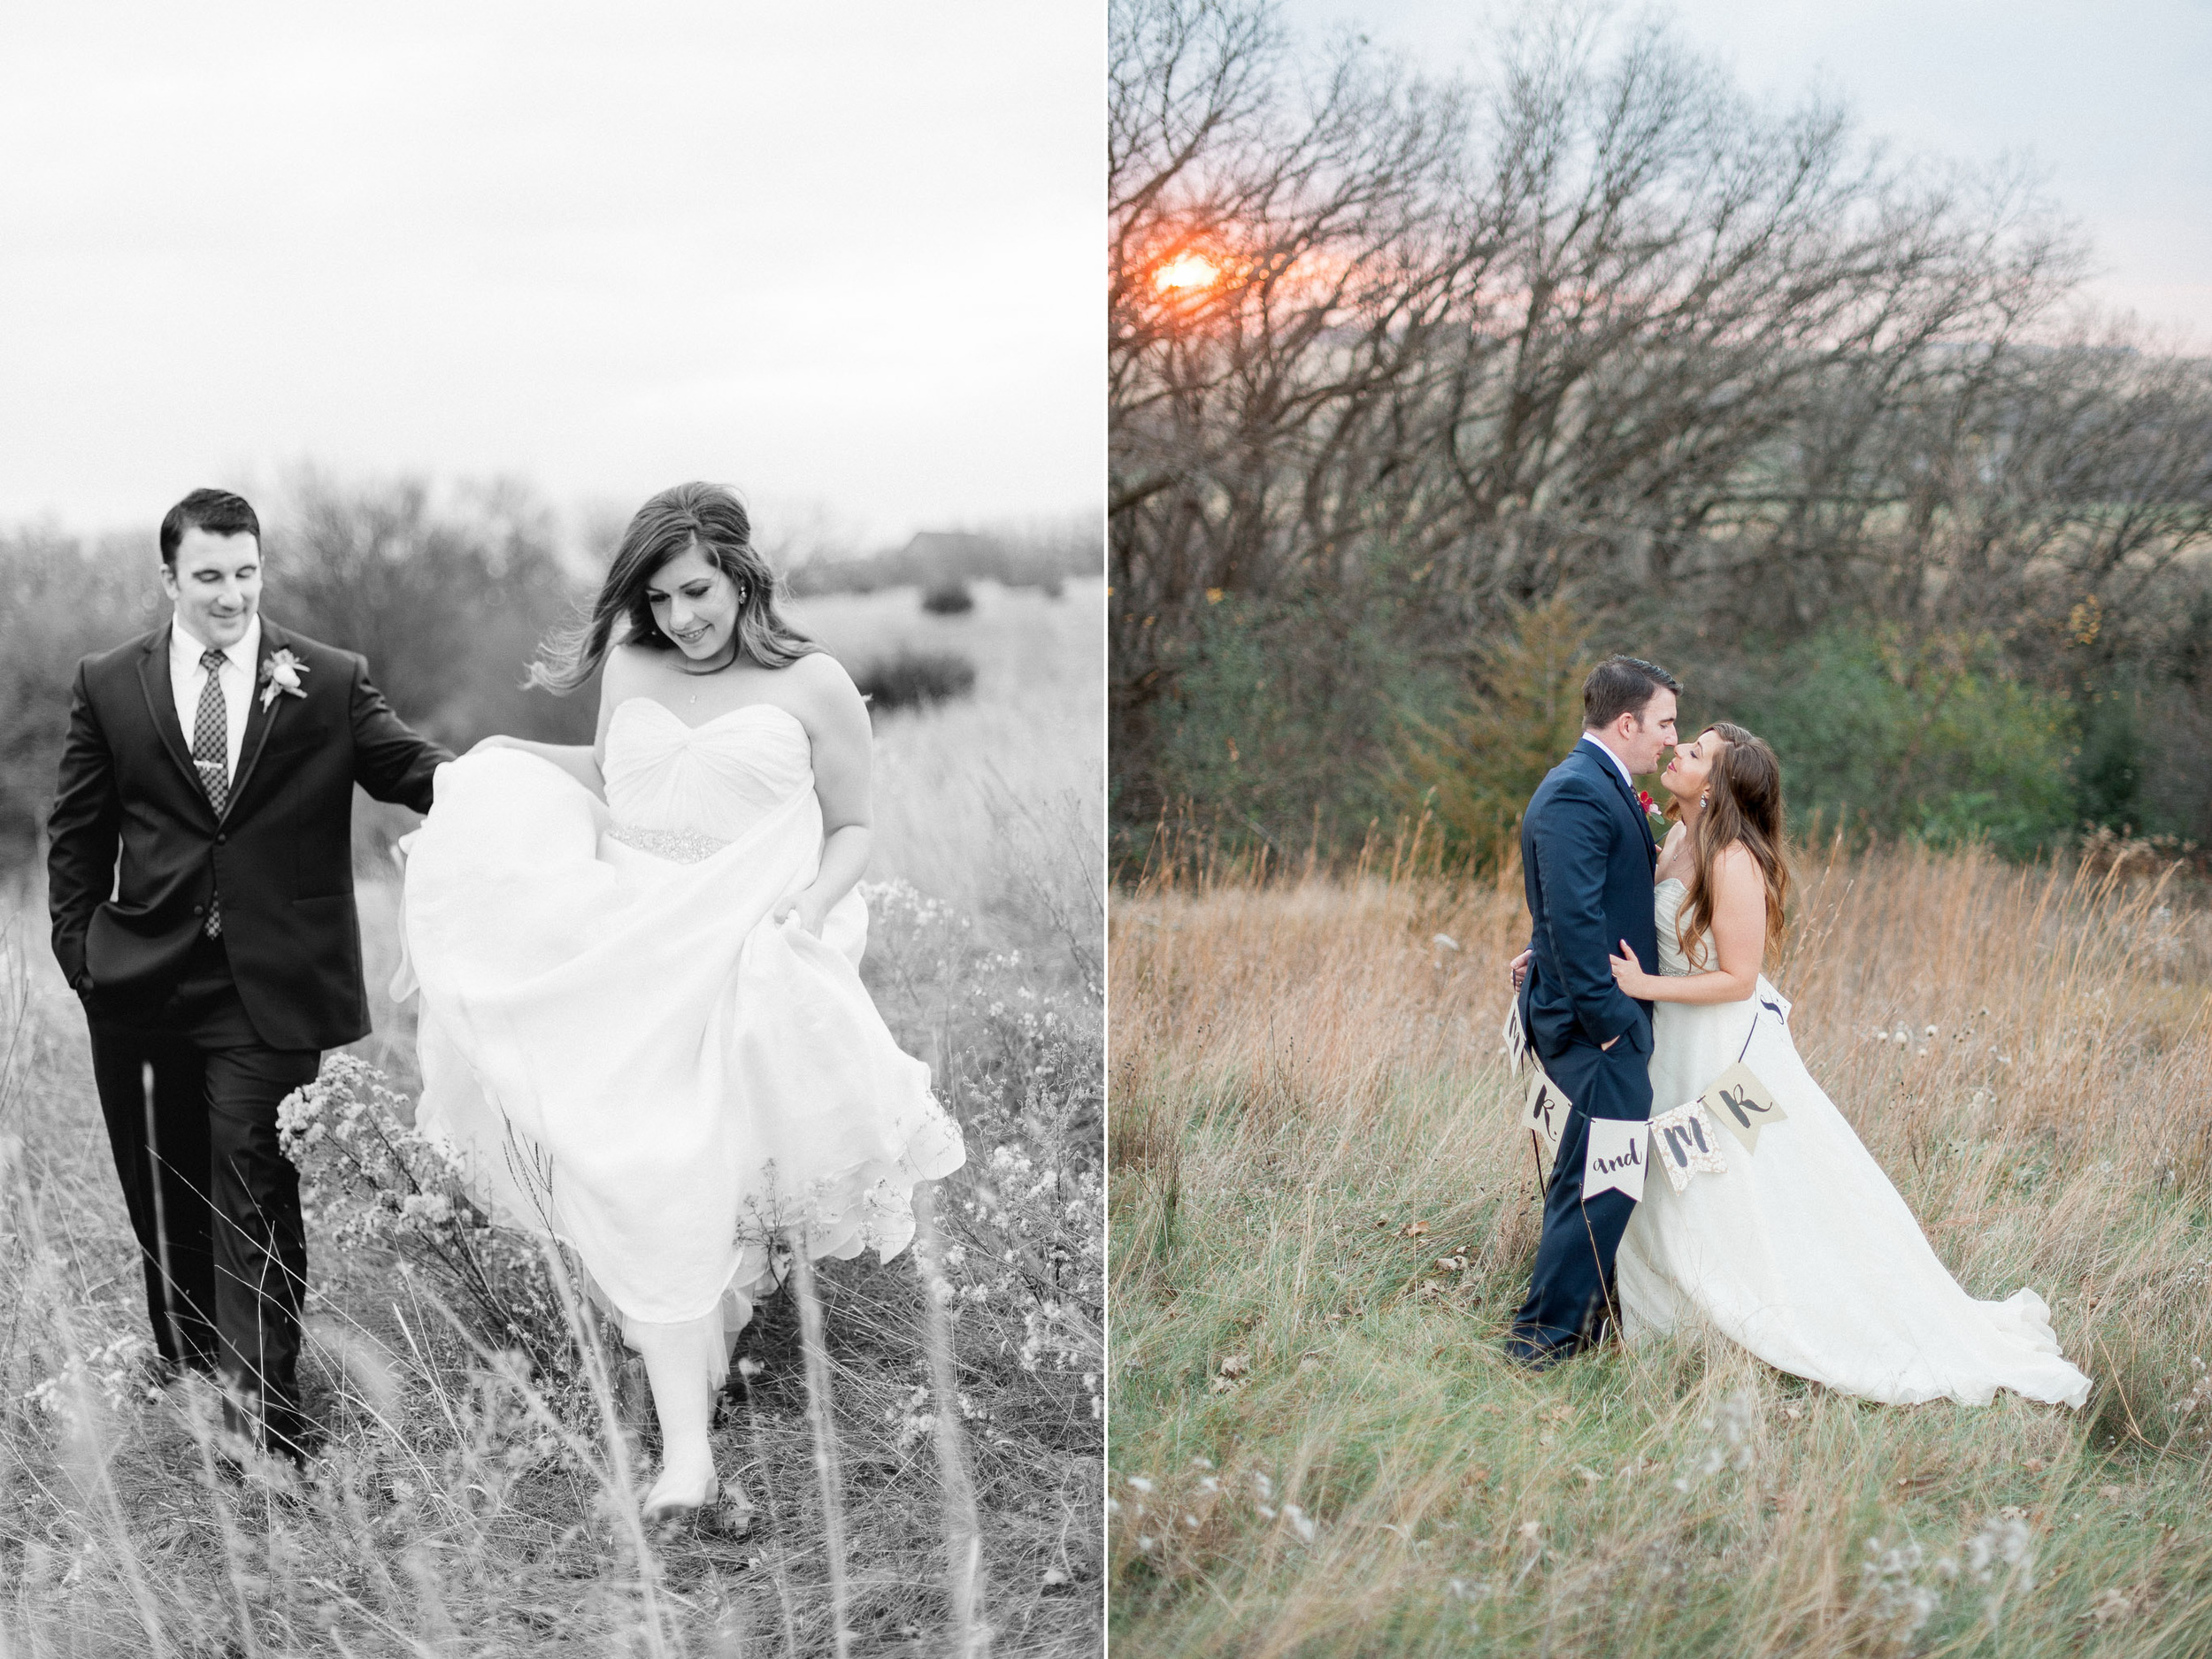 Alyssa and Kyle Wedding-39.jpg